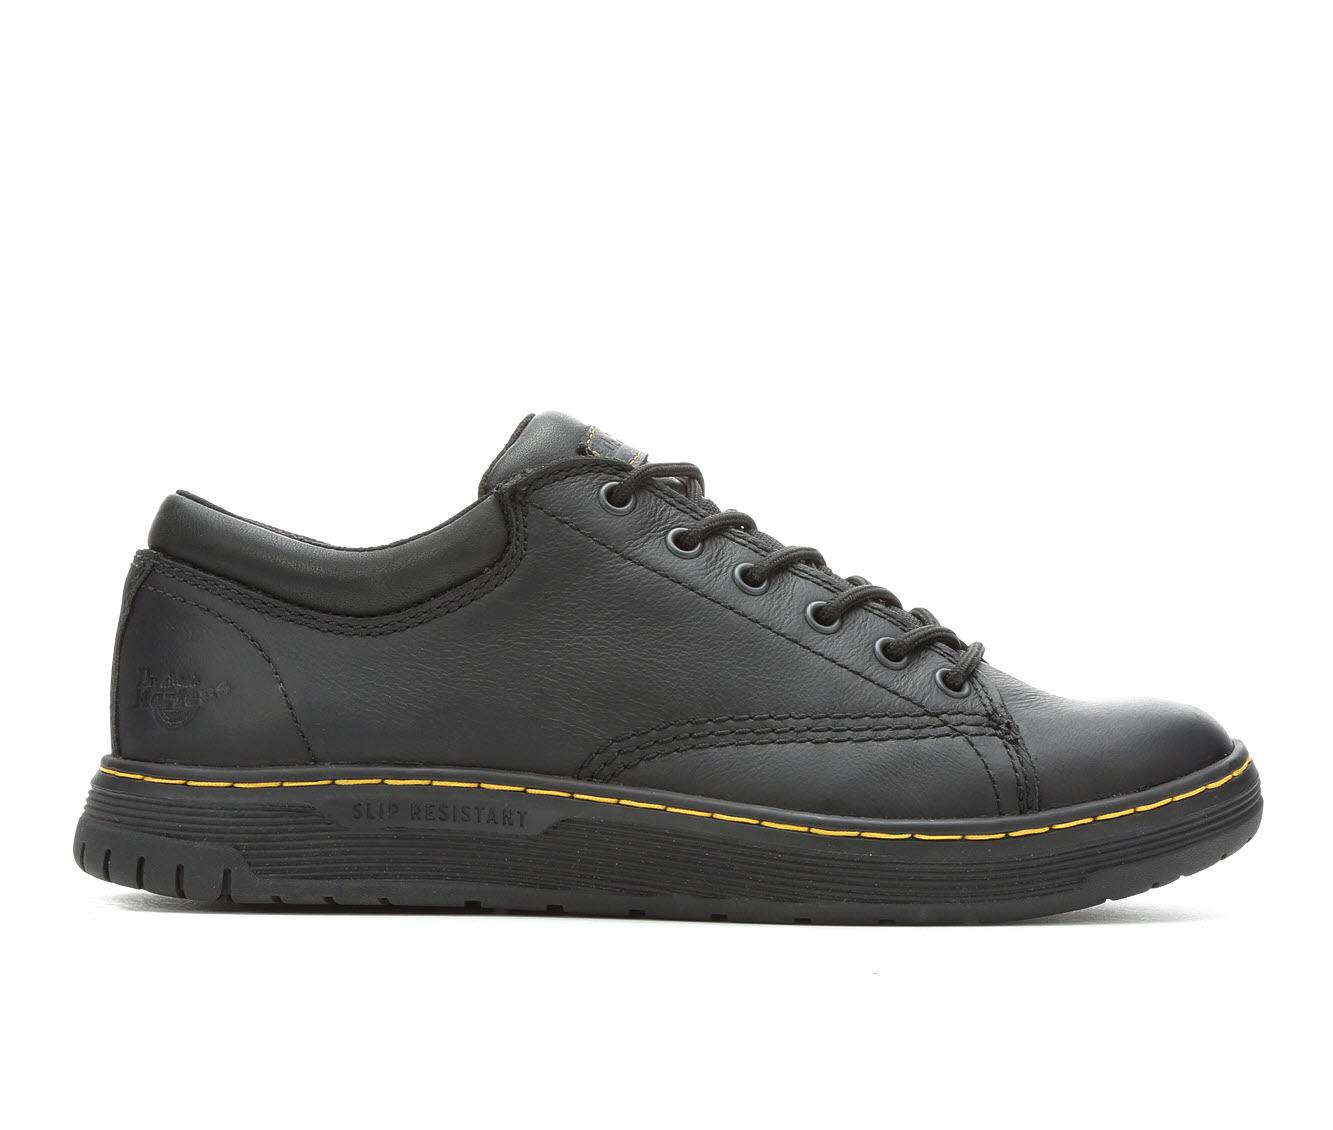 Dr. Martens Industrial Maltby Slip Resistant Men's Boots (Black Leather)